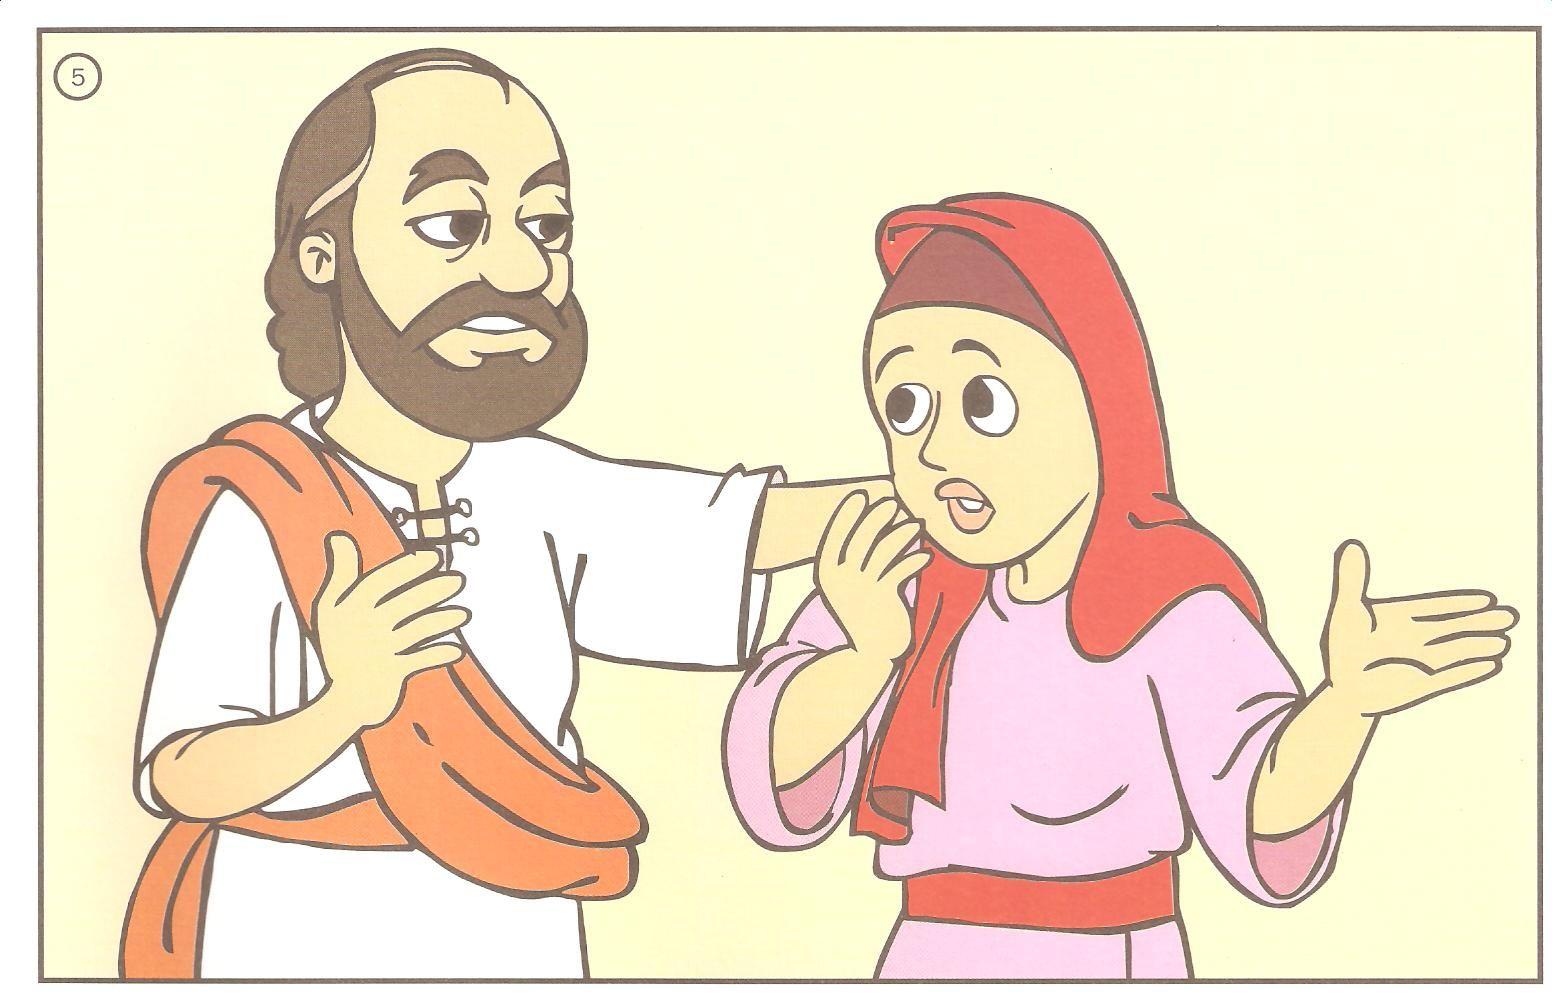 profeta+Eliseu+001.jpg (1552×1008)